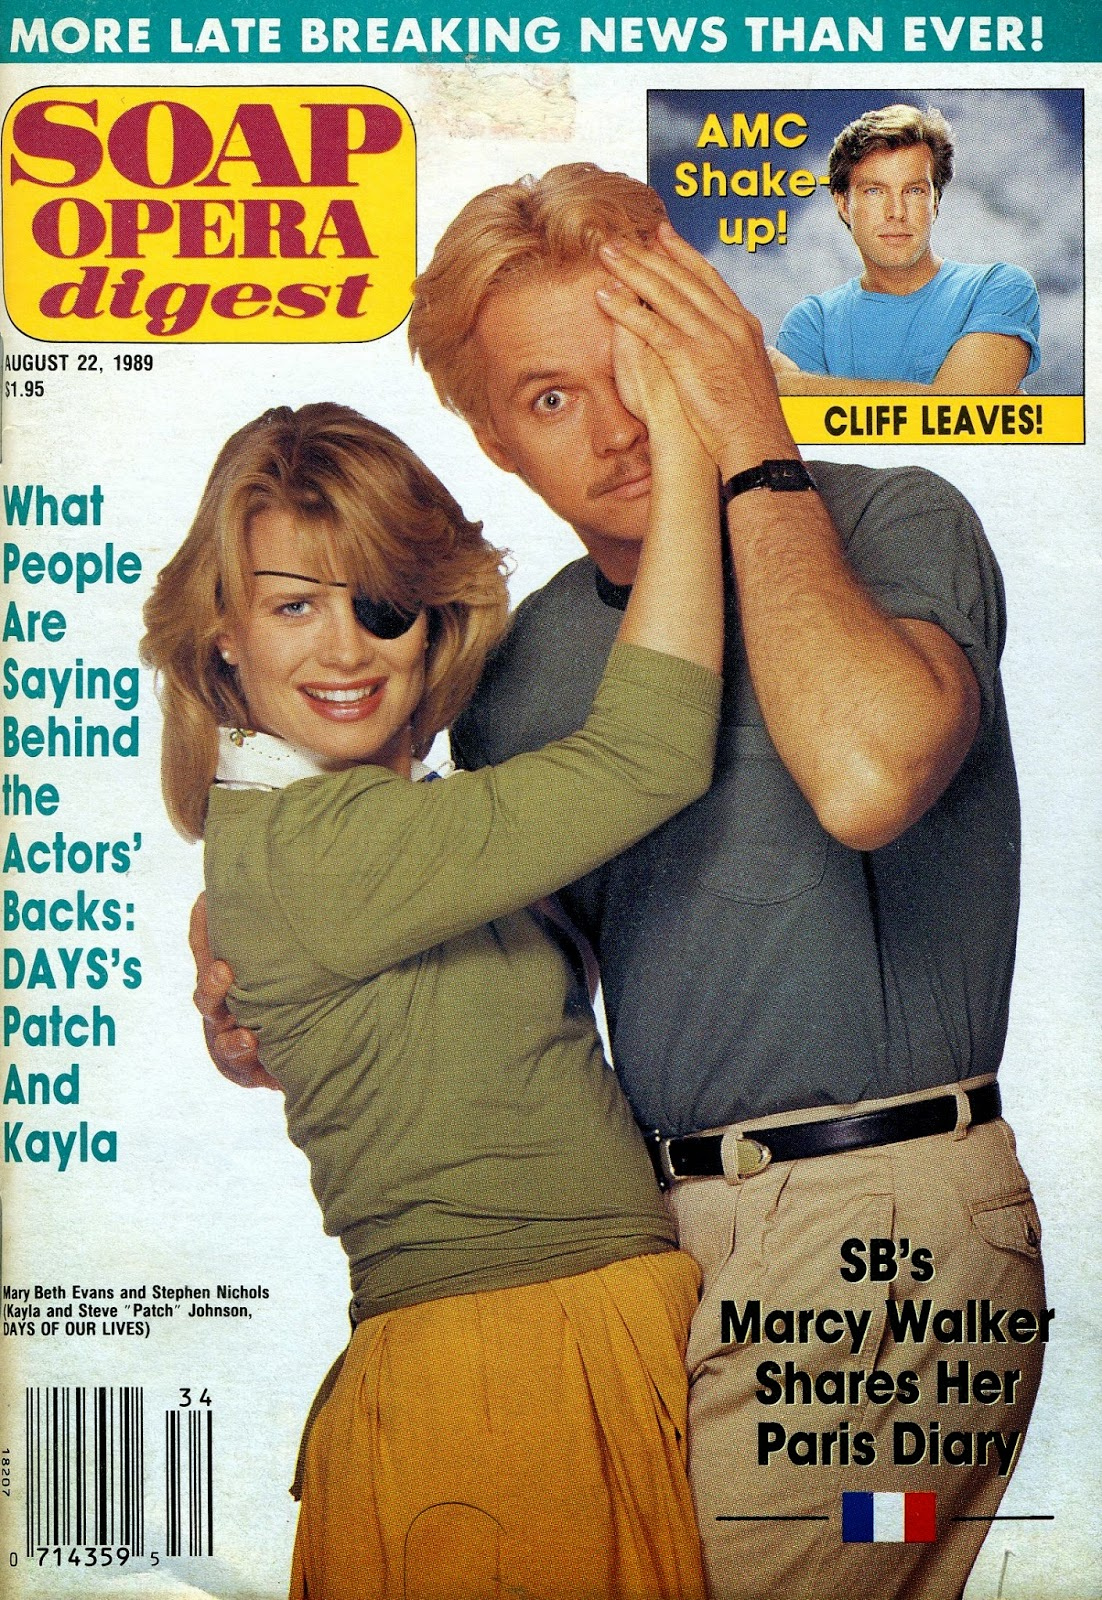 Soap Opera Digest Cover-September 22, 1994